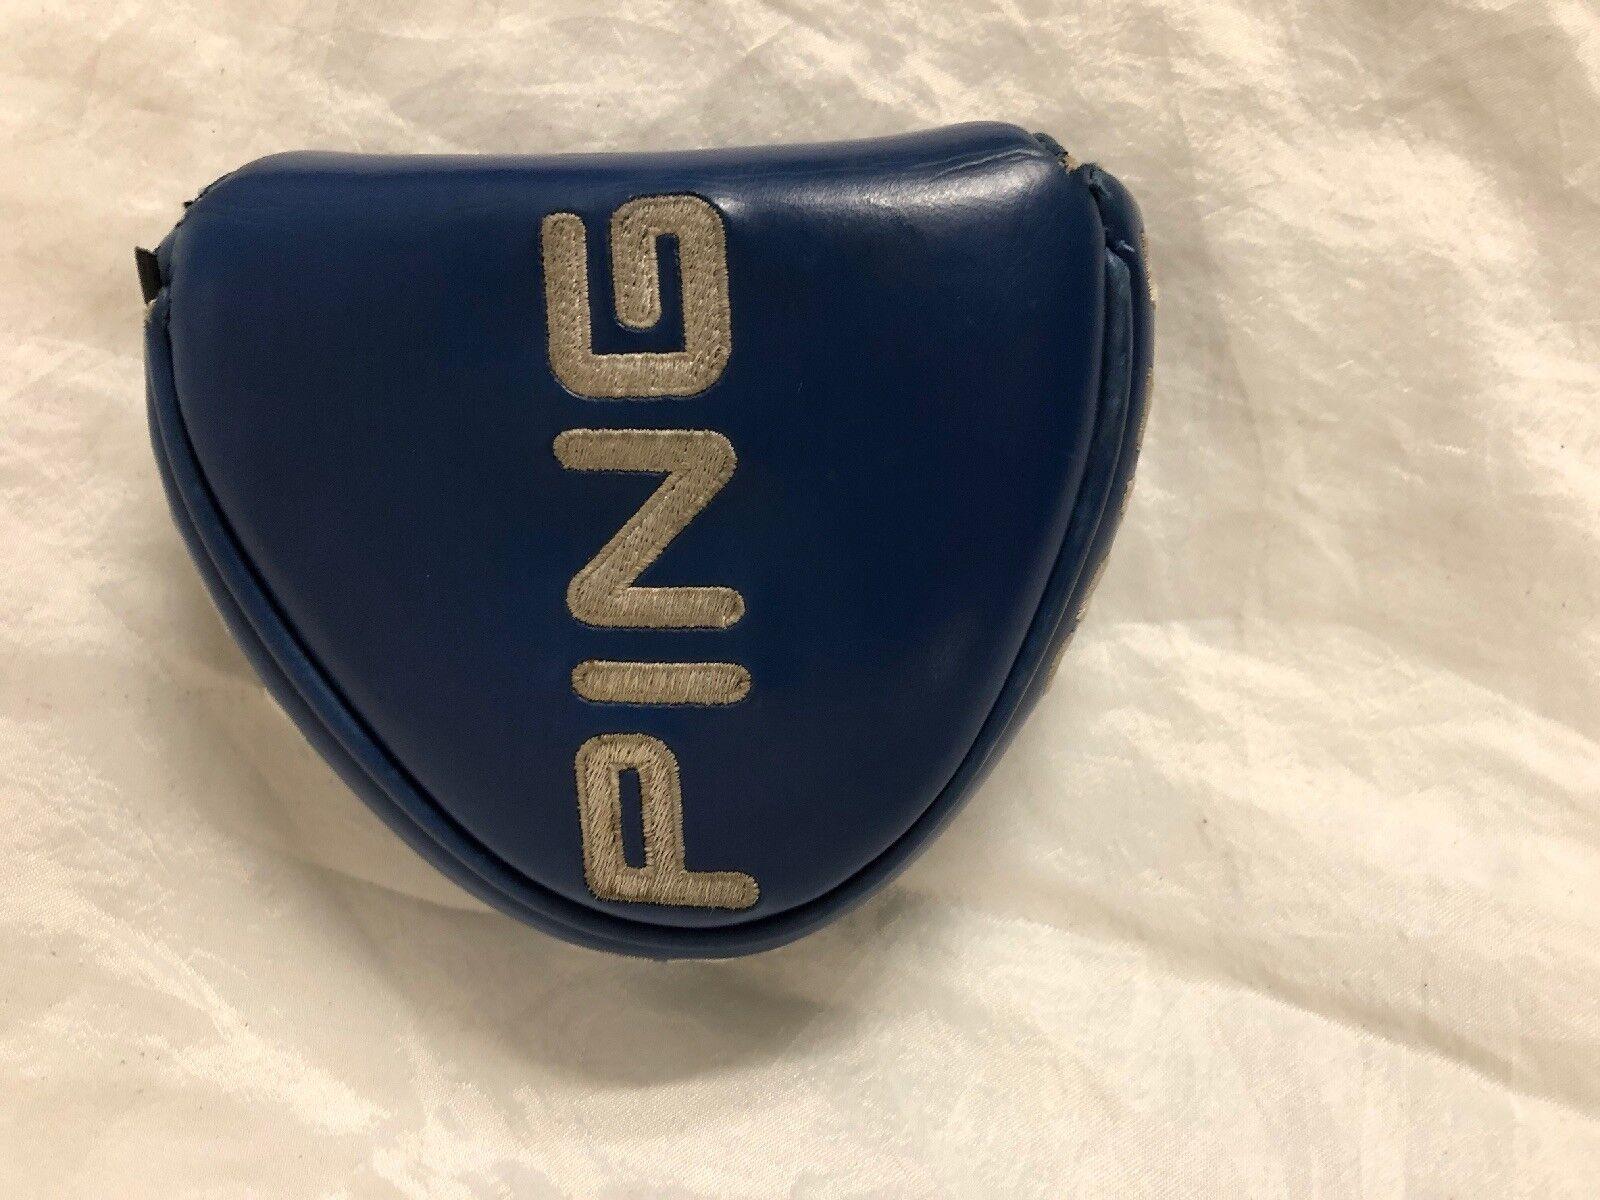 Ping G2i Craz-E Mallet Putter Cover Headcover (J)